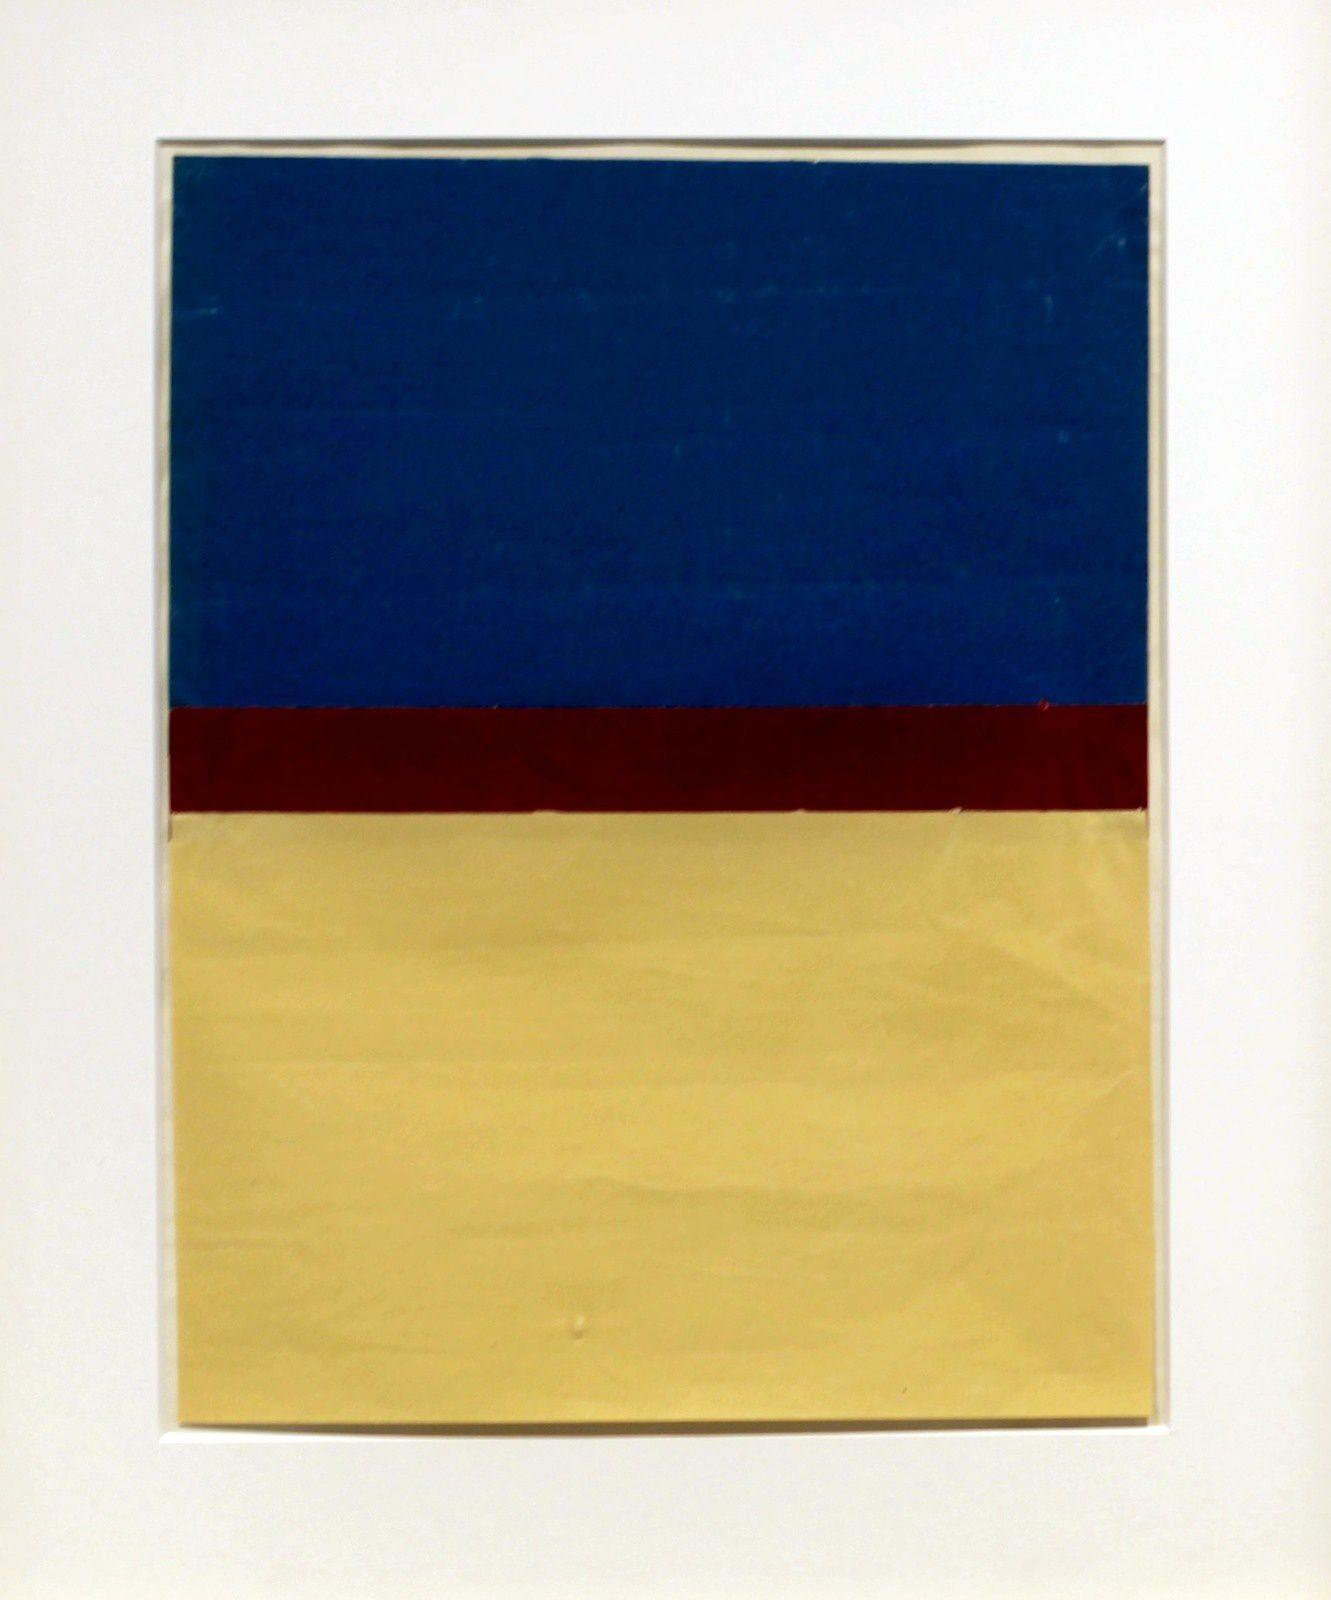 """Ohne Titel"", 1952 de Arnulf RAINER - Courtesy Galerie Thaddaeus Ropac © Photo Éric Simon"